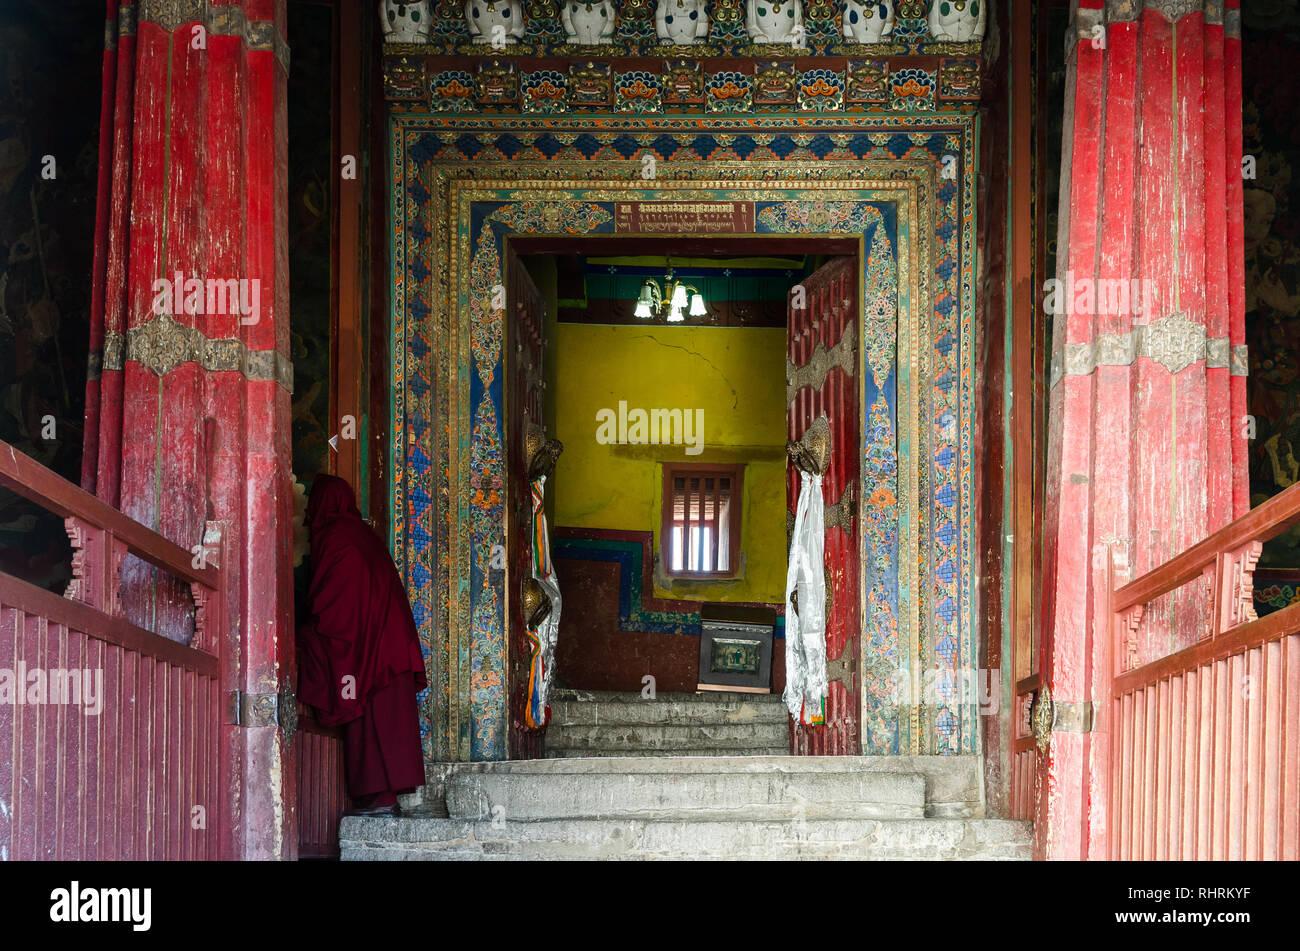 Tibetan Buddhist monk at the entrance of Potala Palace, Lhasa, Tibet - Stock Image